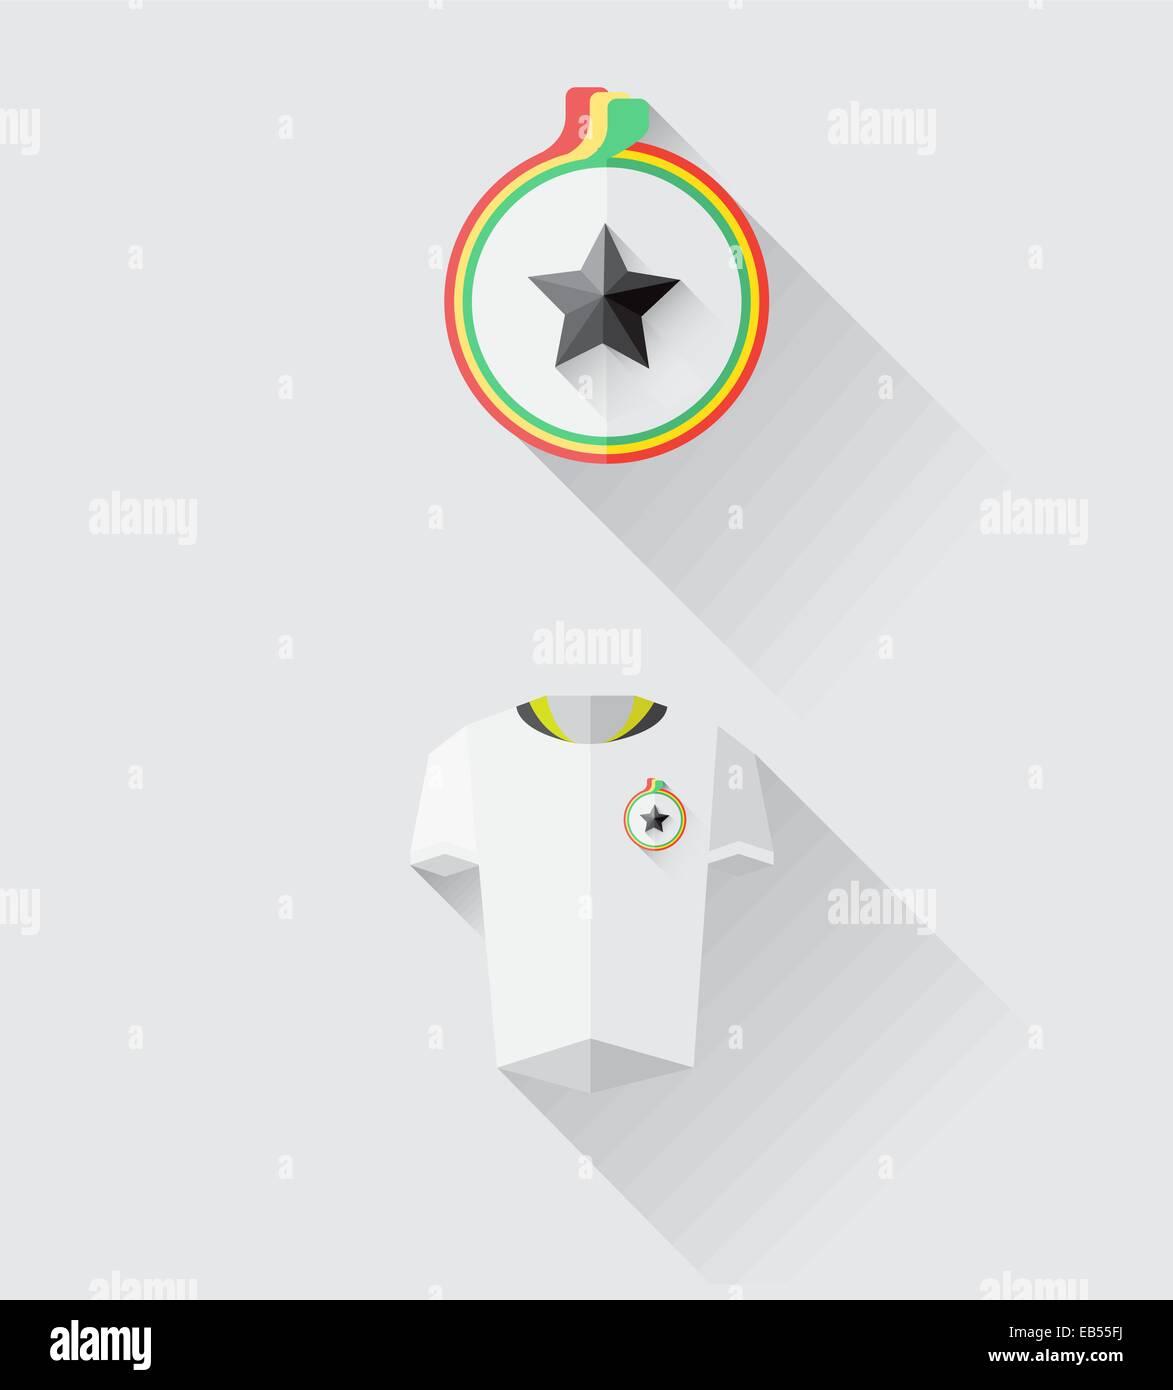 Ghana jersey and crest vector - Stock Vector